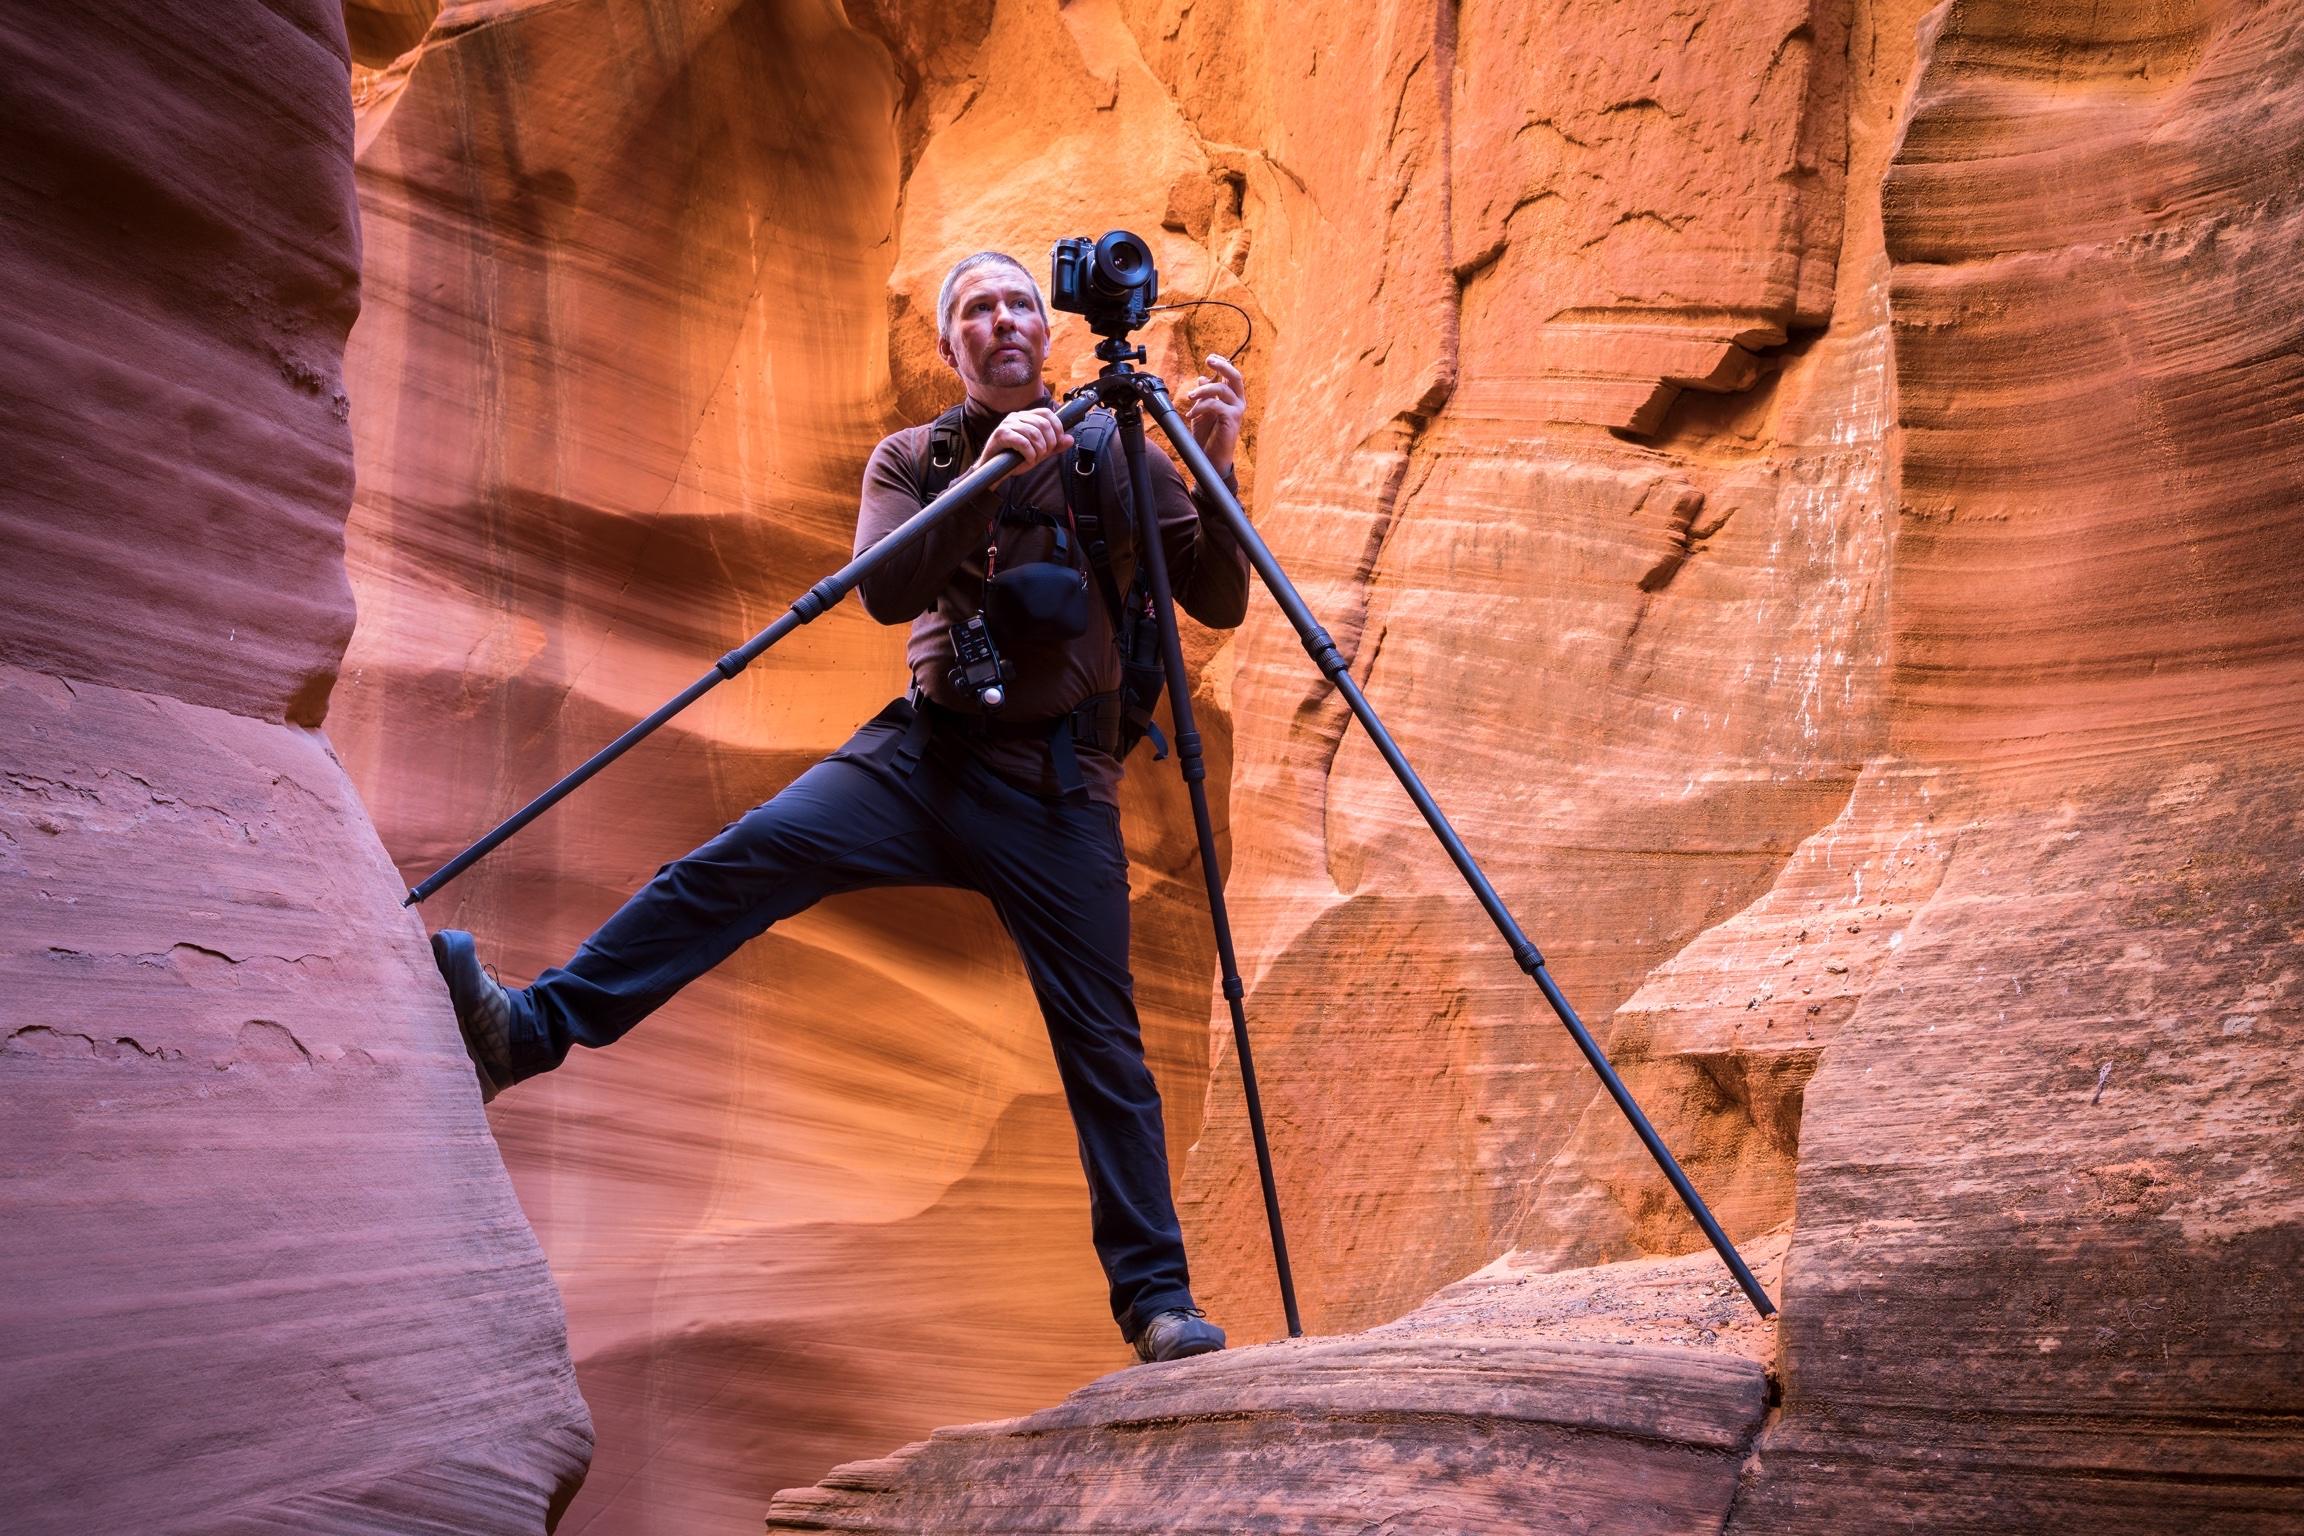 Raynor Czerwinski catching the light…(photo by Josh Merrill)